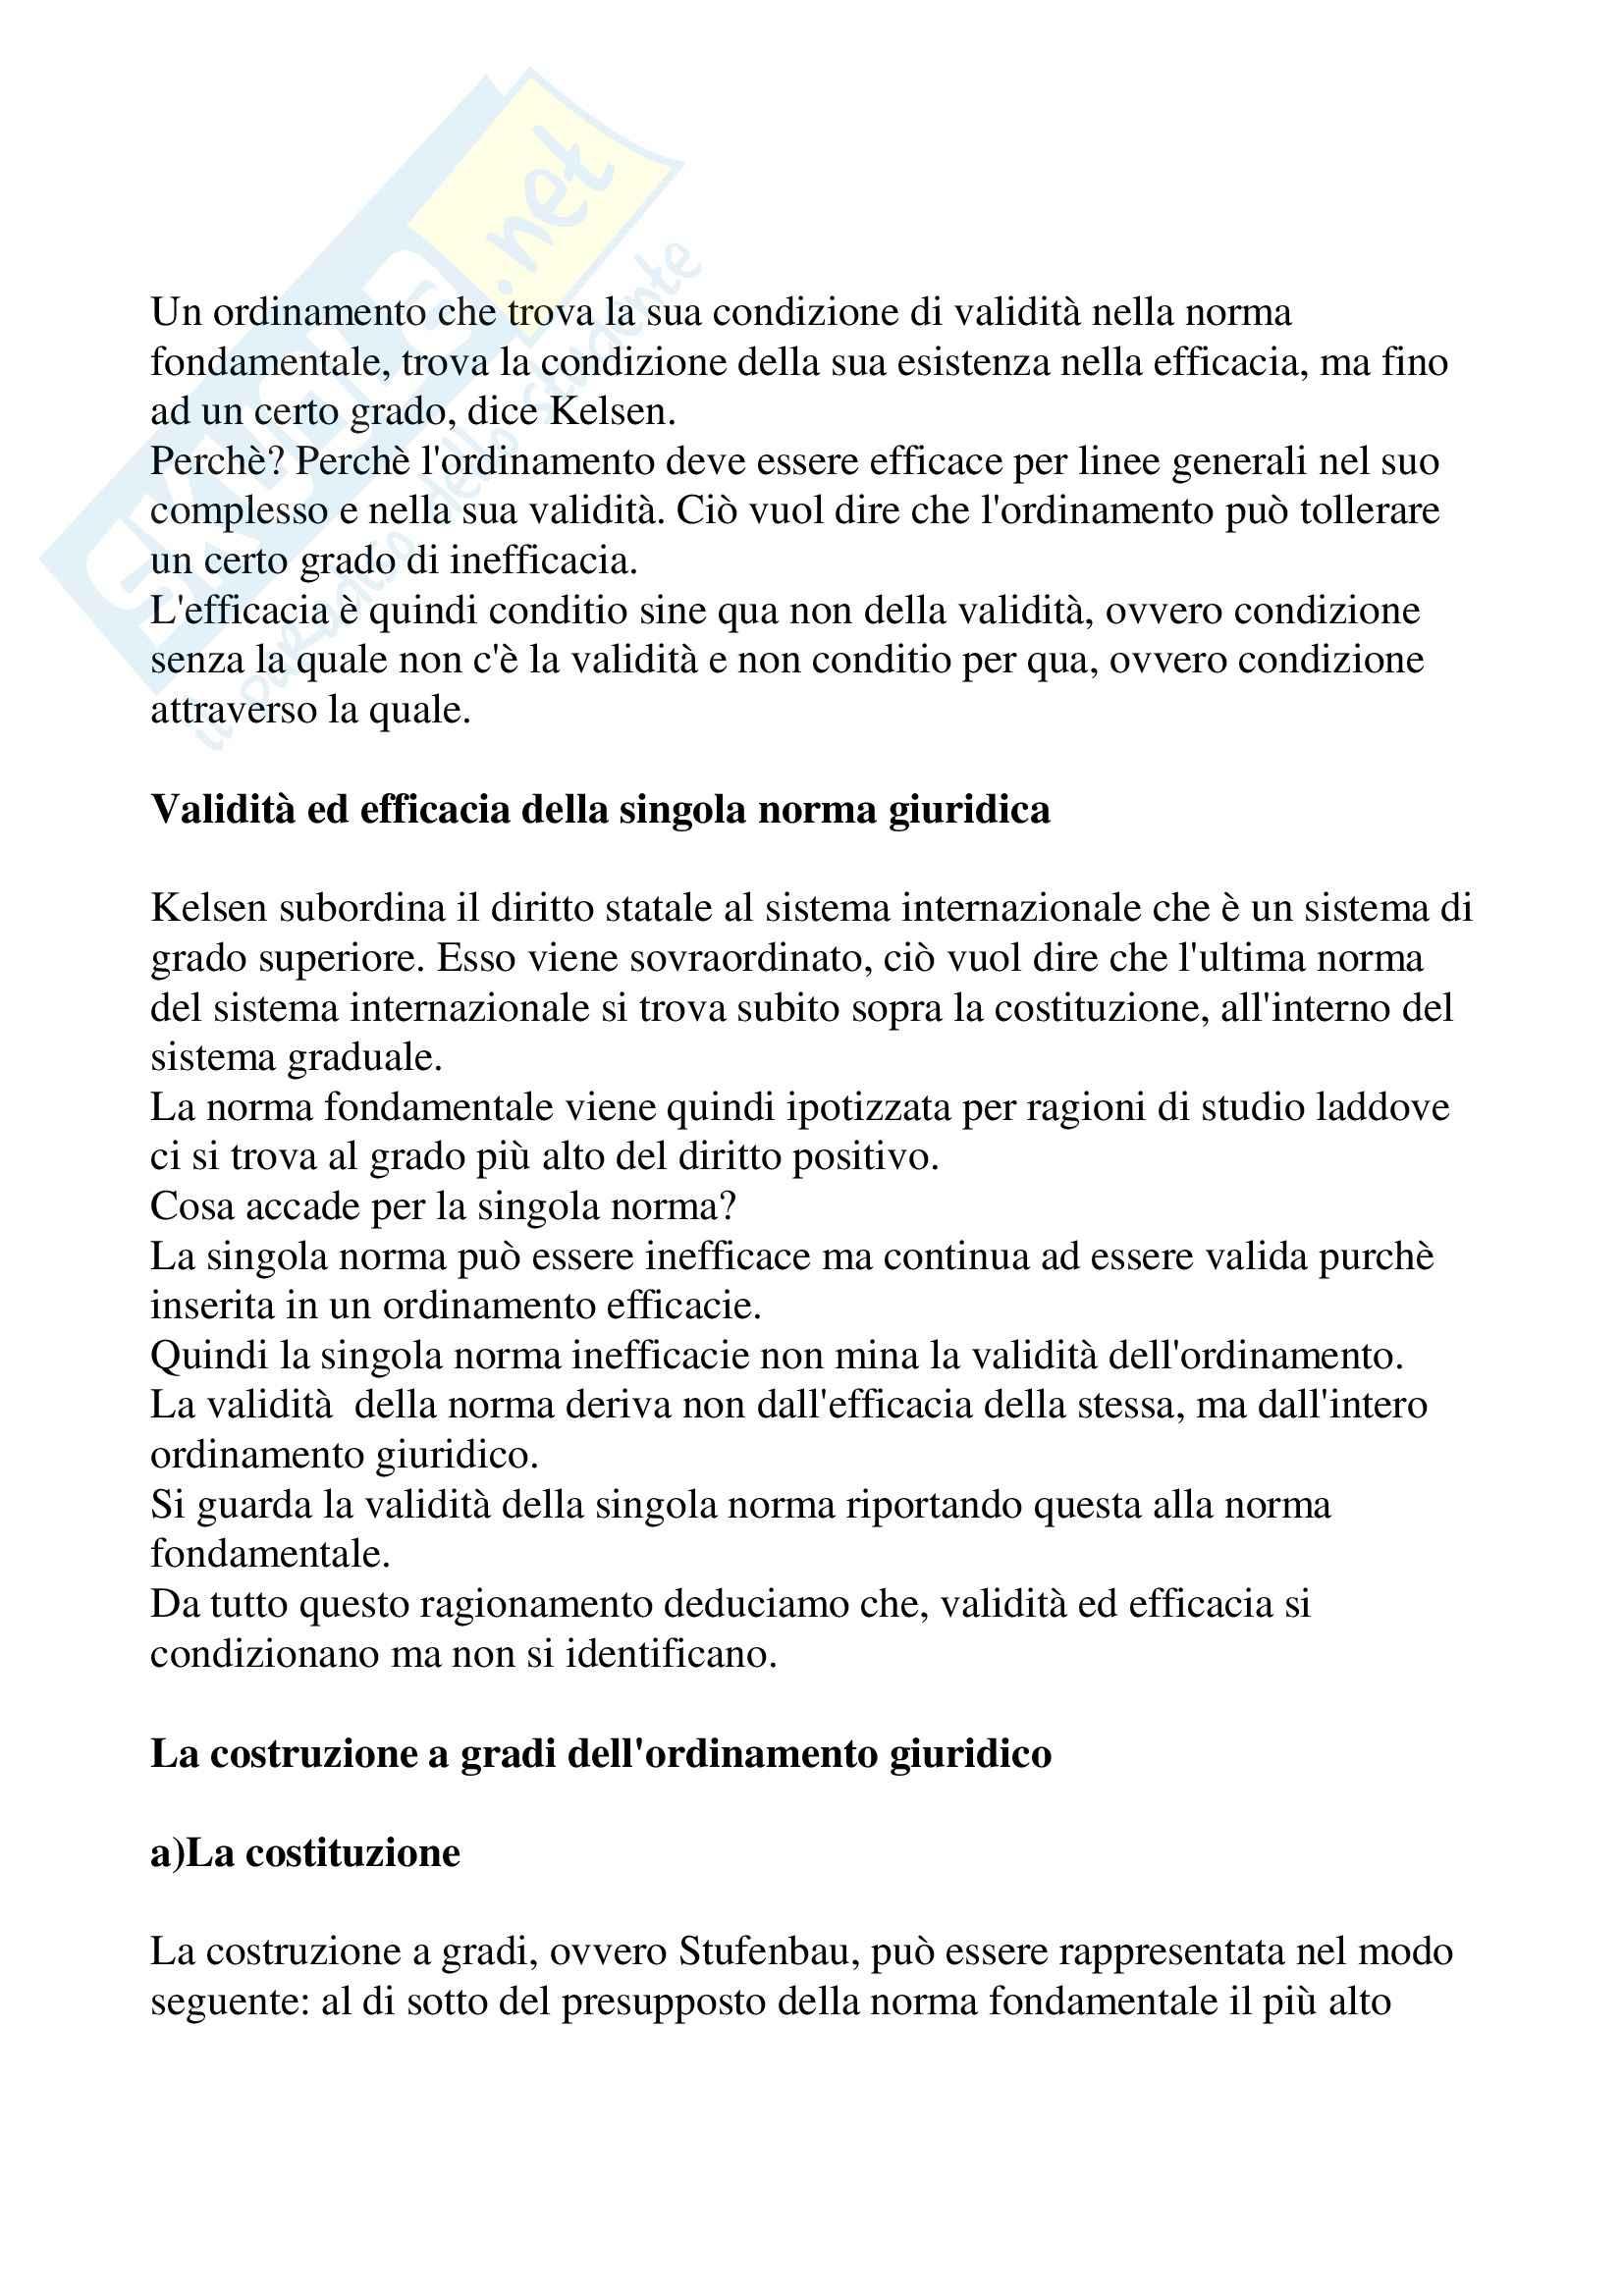 Filosofia del diritto - Kelsen Pag. 16